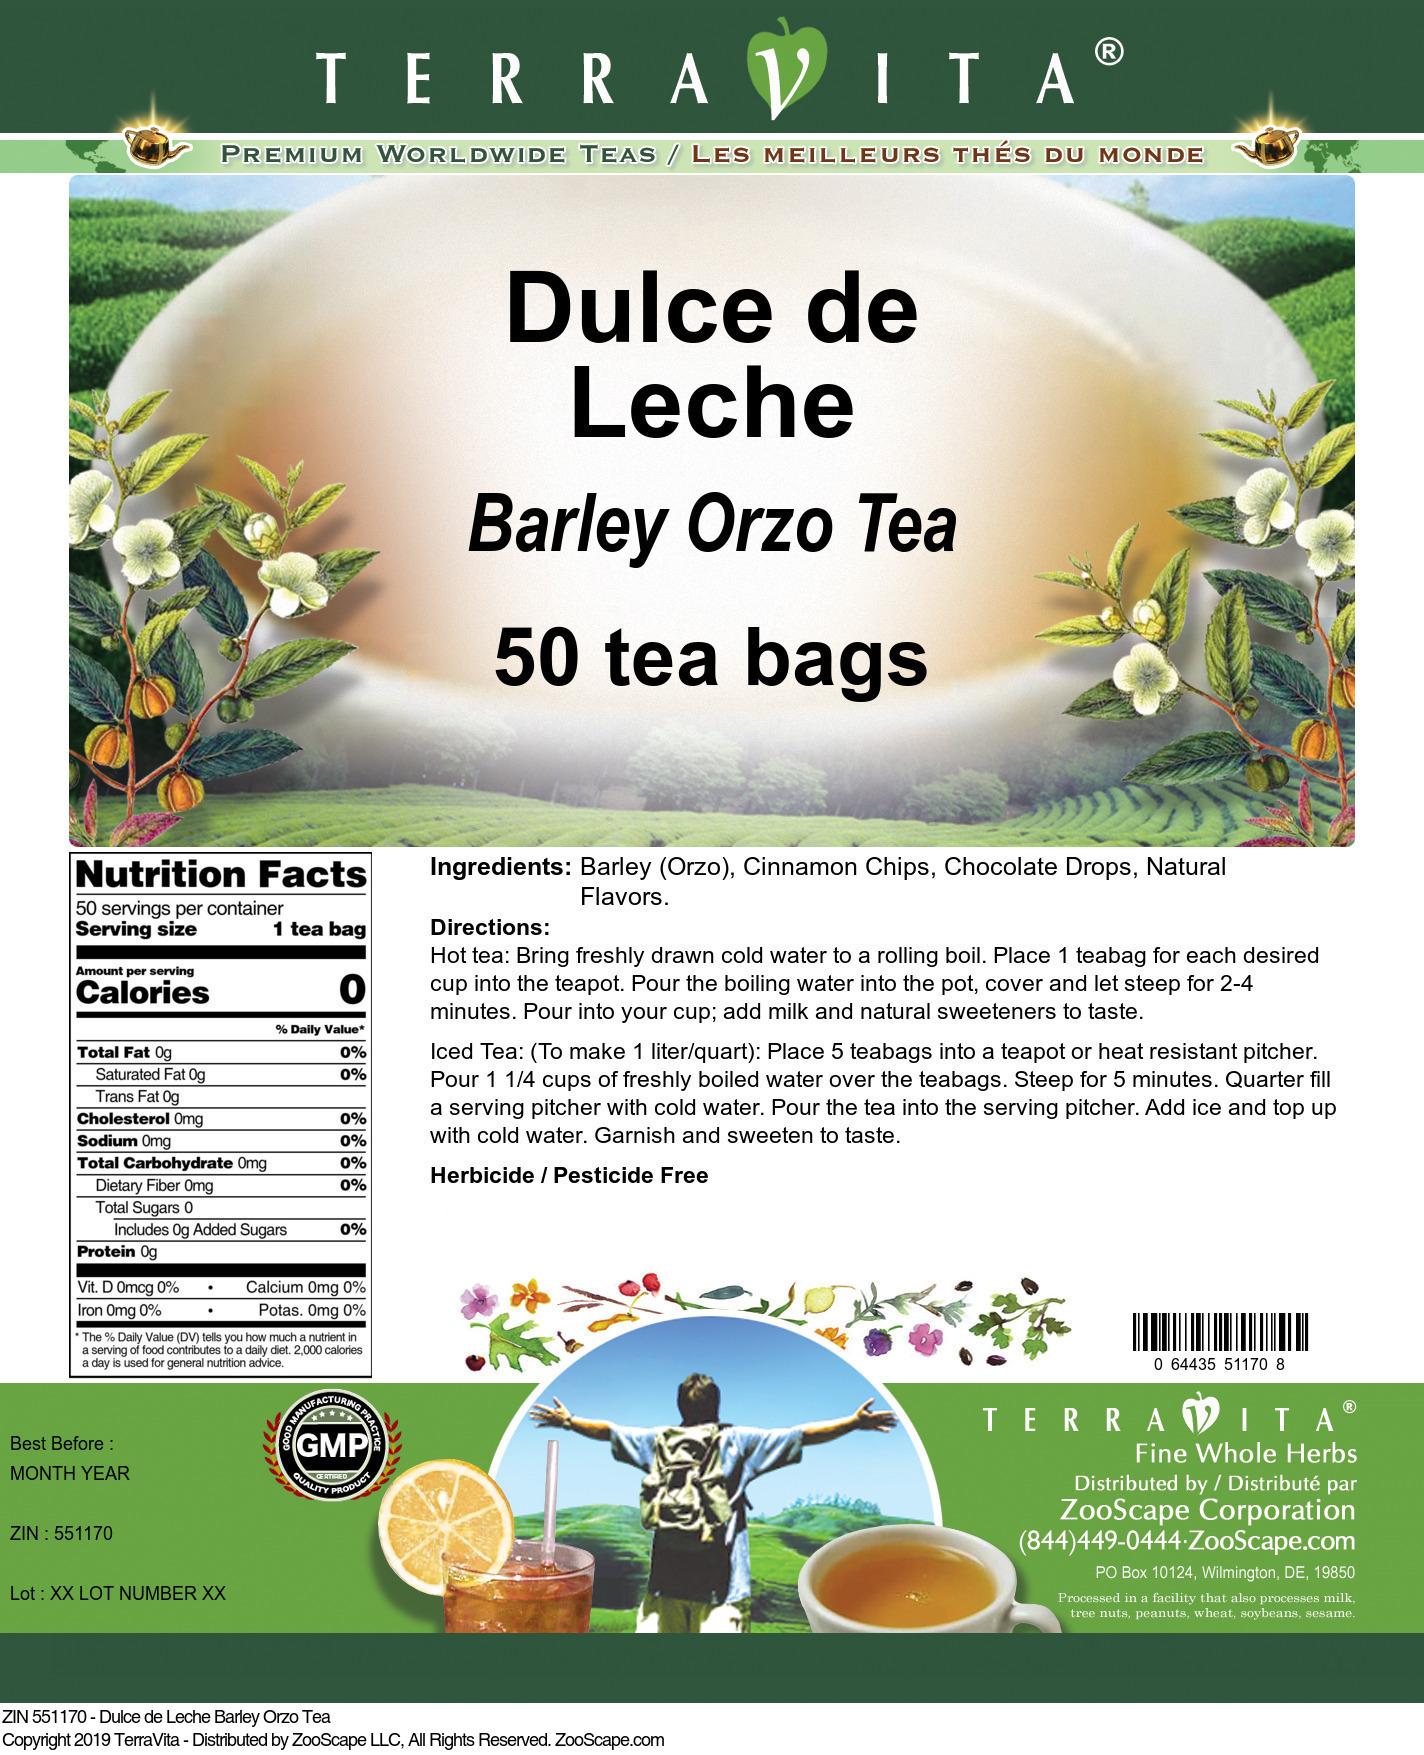 Dulce de Leche Barley Orzo Tea